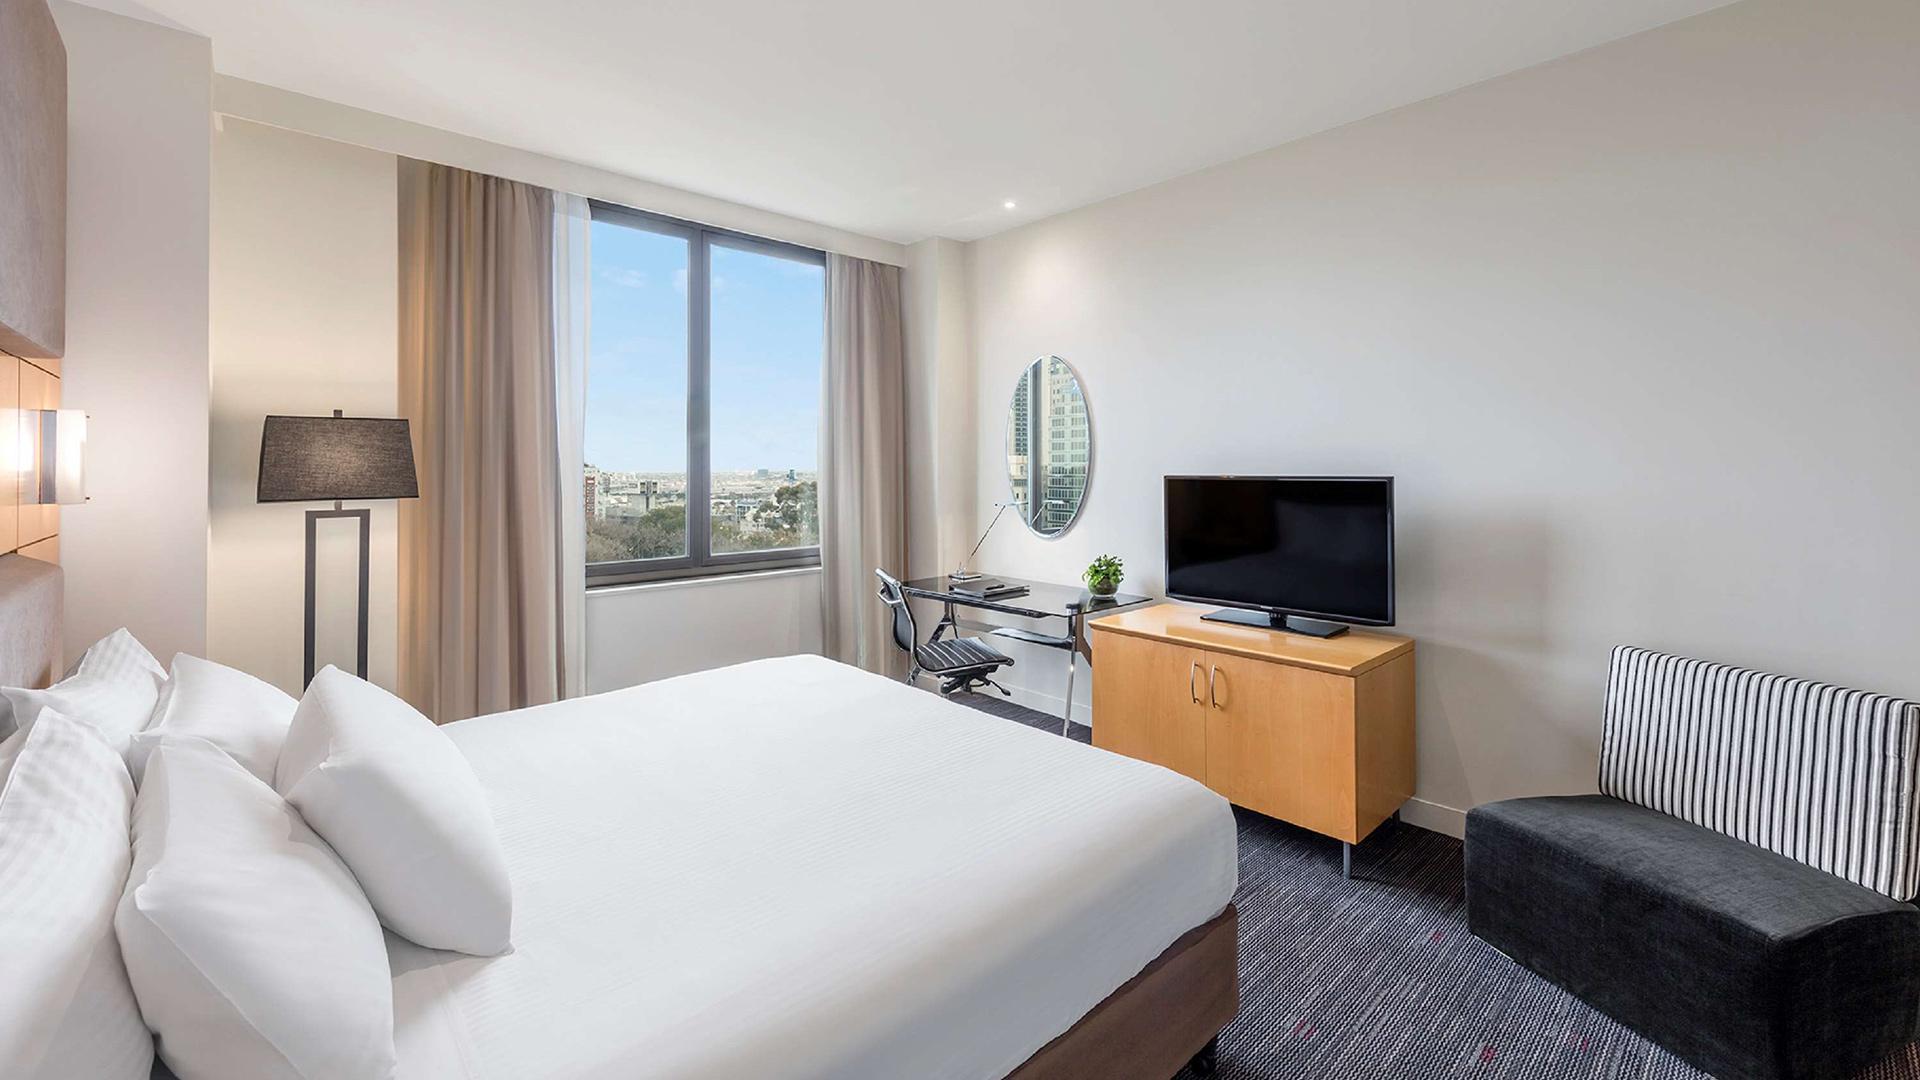 Superior Park View Room image 1 at Radisson on Flagstaff Gardens Melbourne by Melbourne City, Victoria, Australia